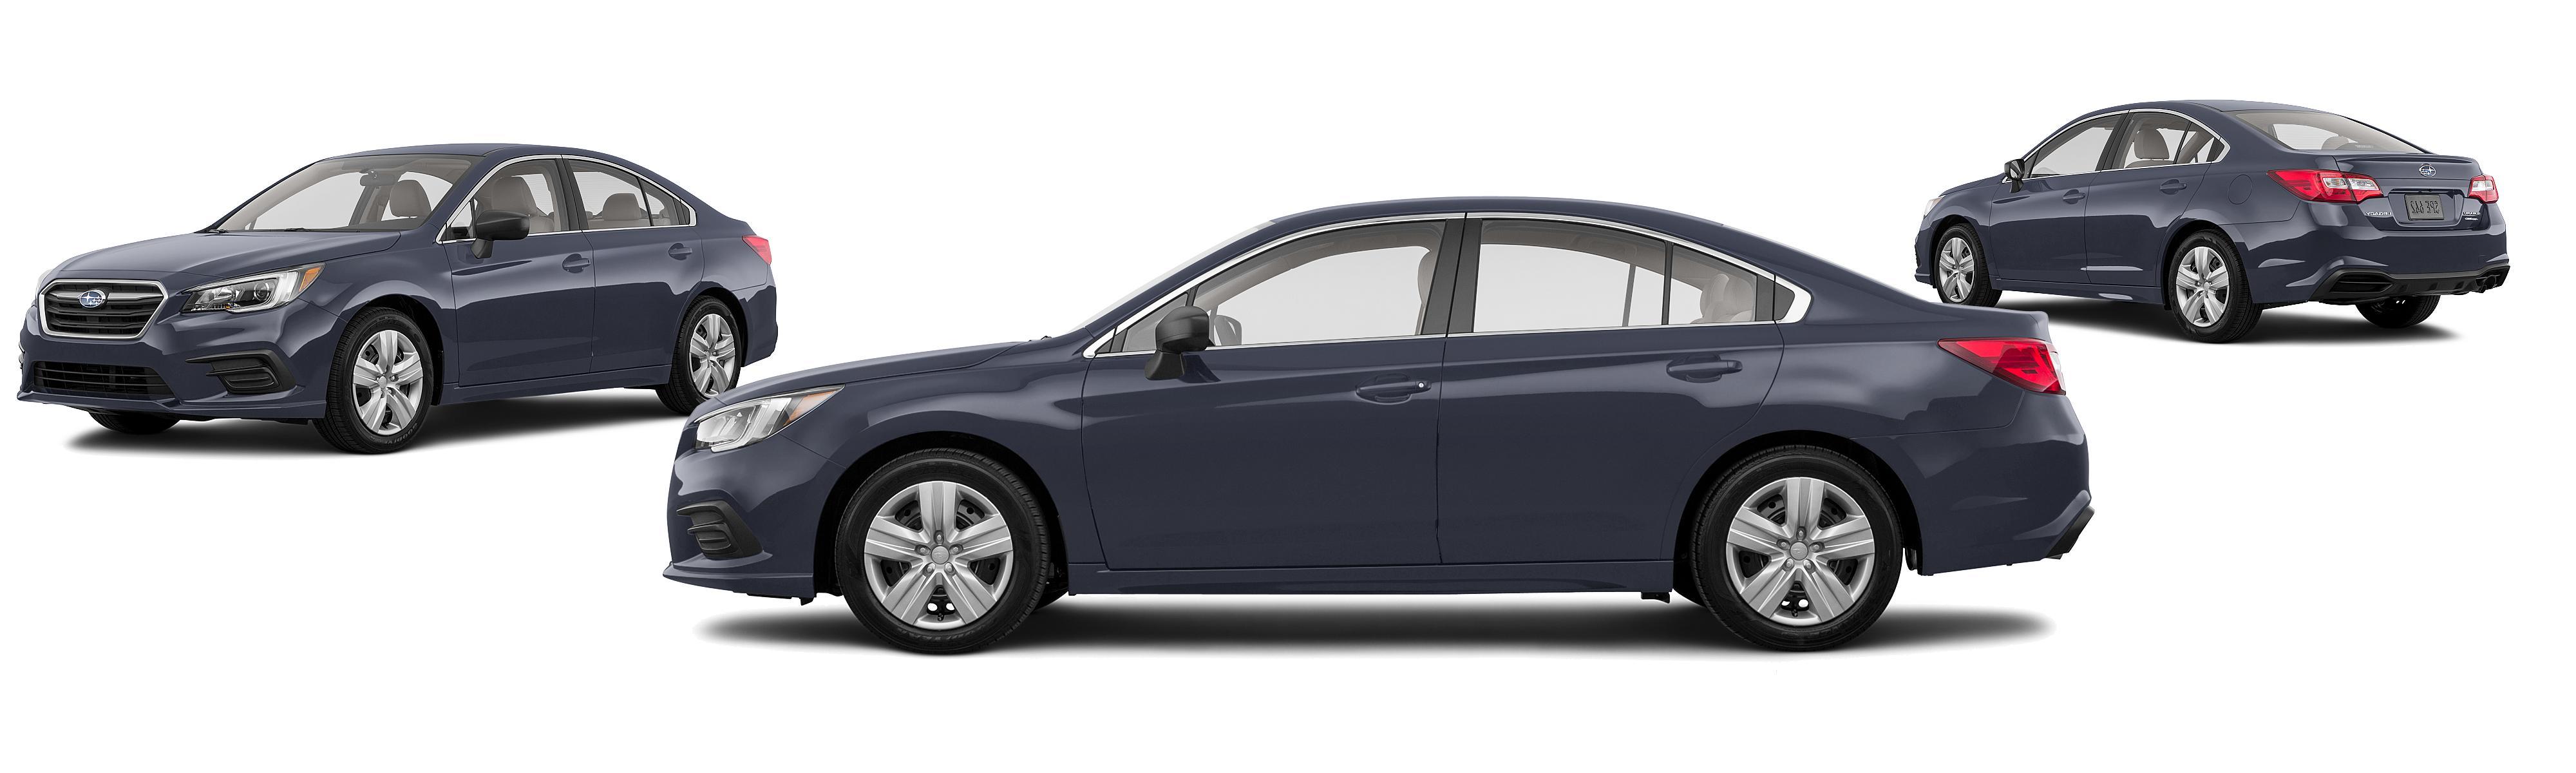 Subaru Legacy AWD I Dr Sedan Research GrooveCar - 2018 subaru legacy invoice price